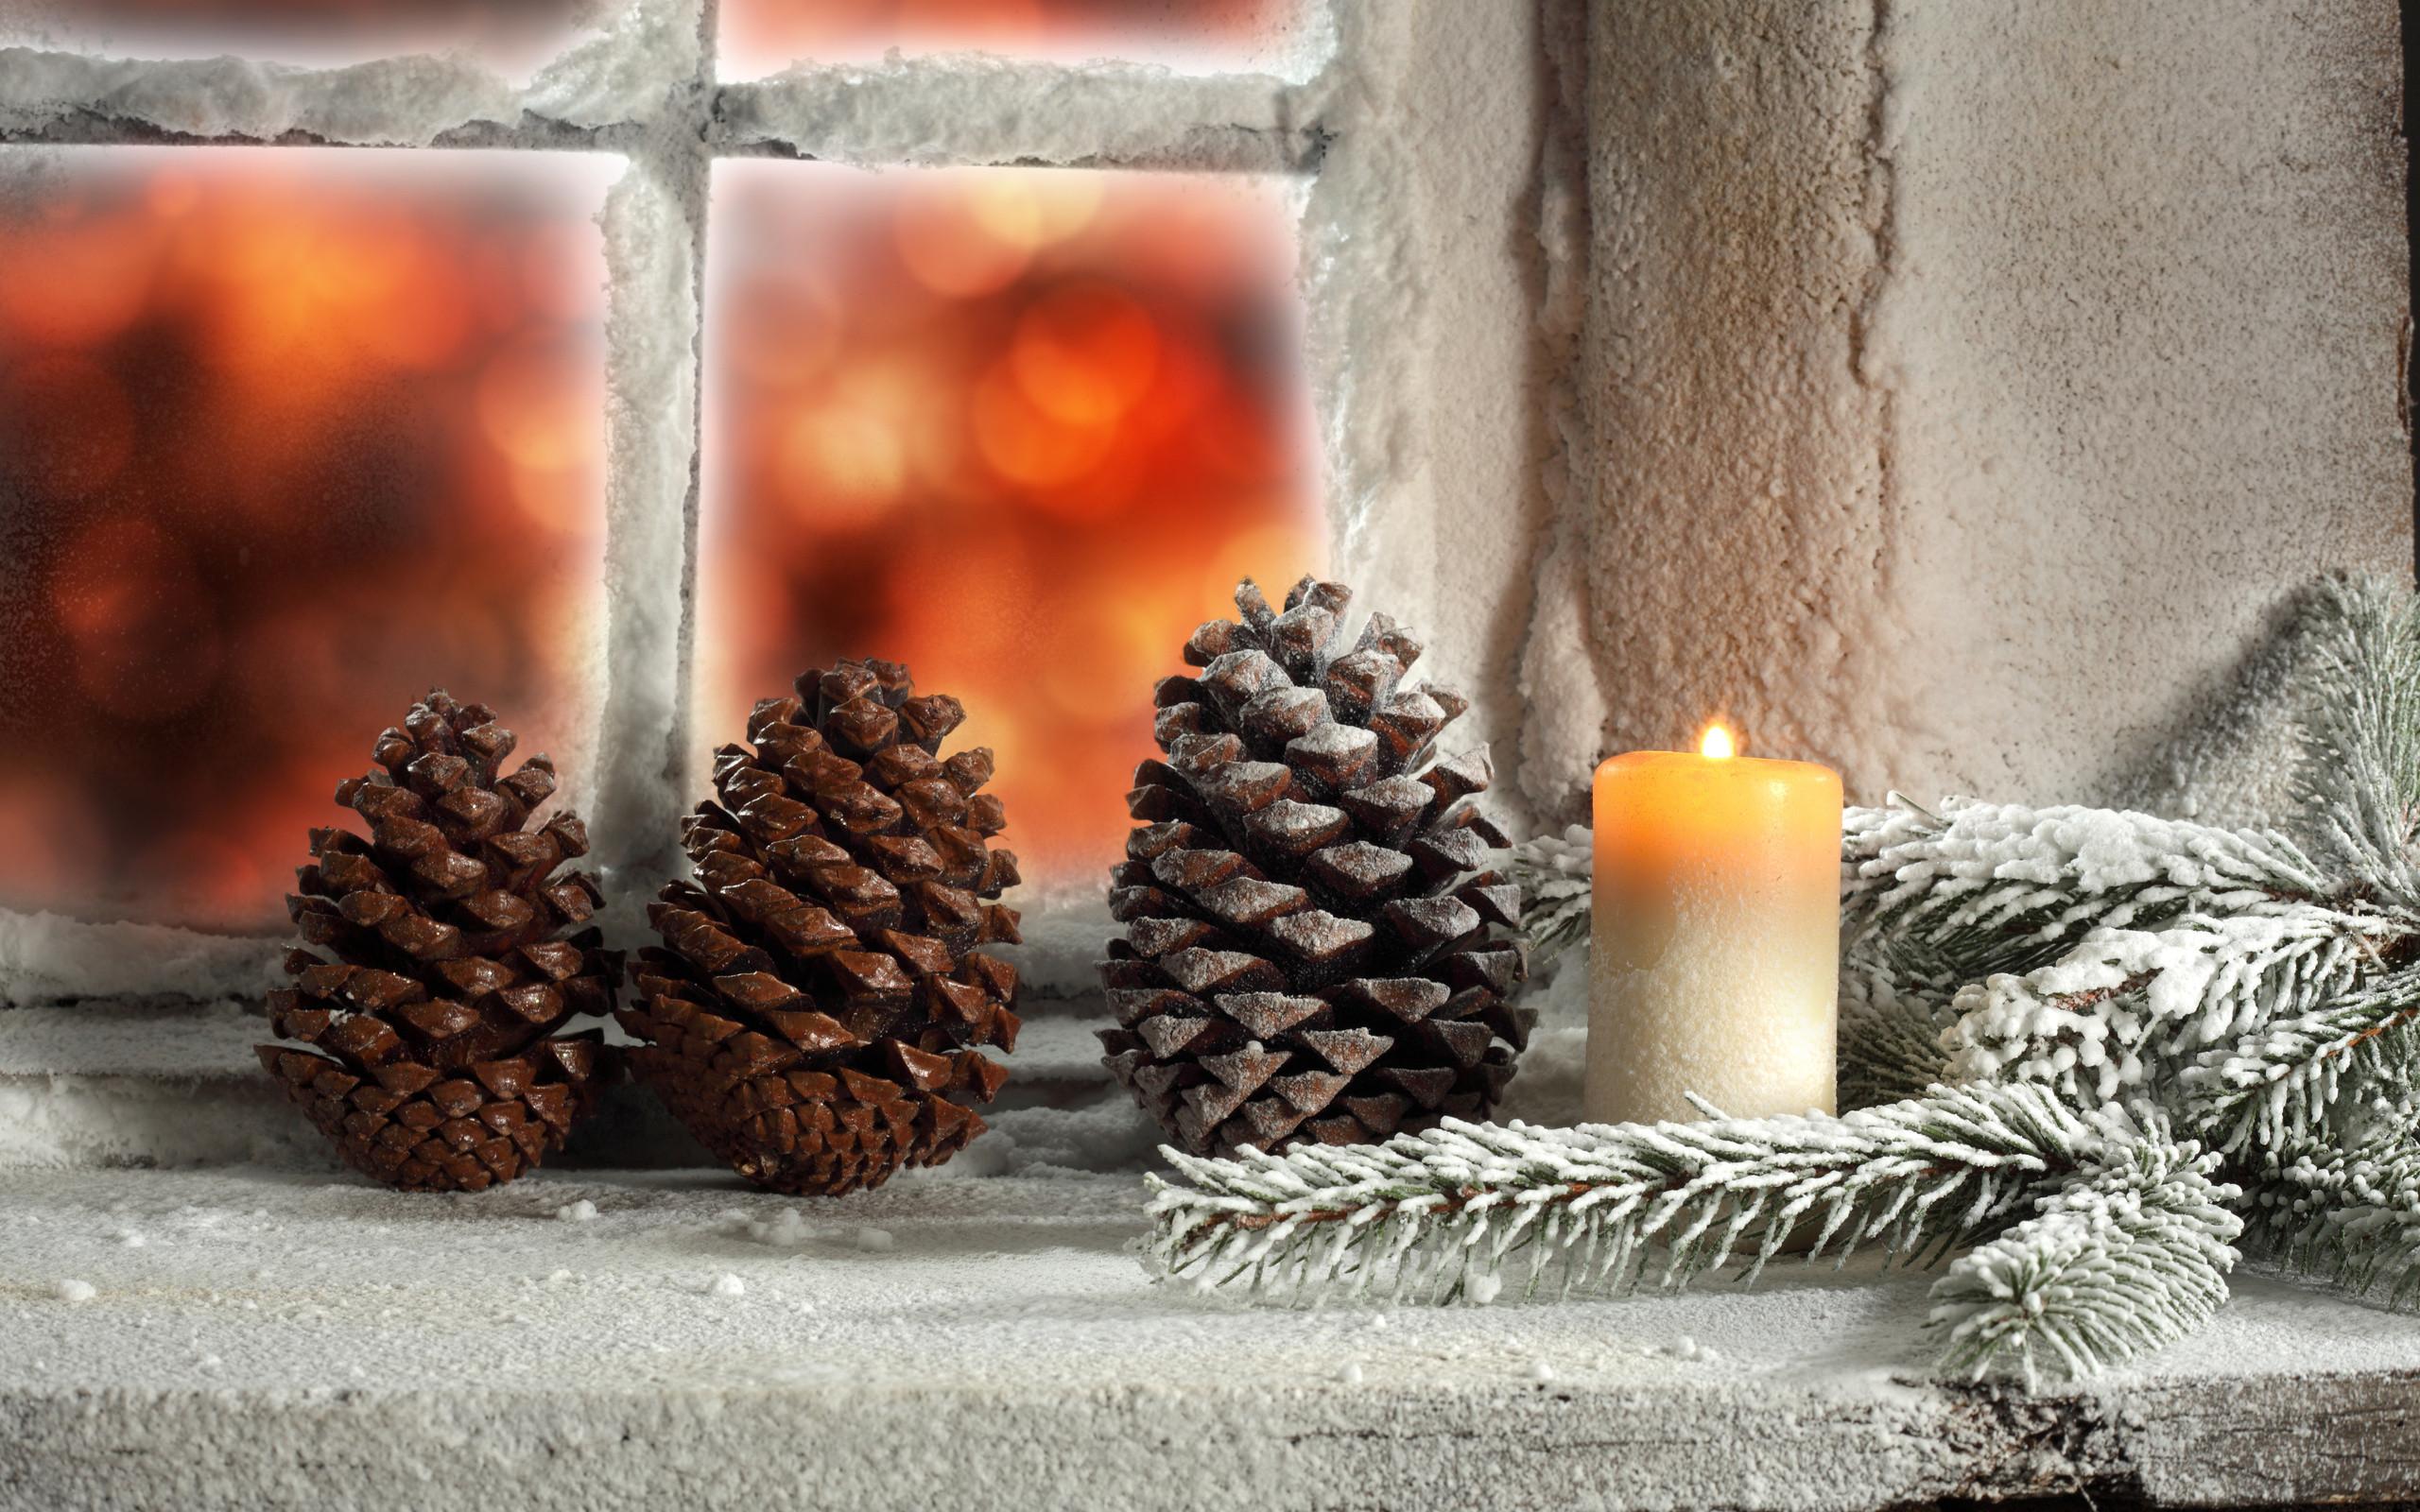 Christmas Winter Scene Wallpaper Desktop The Best HD Wallpaper 2560x1600